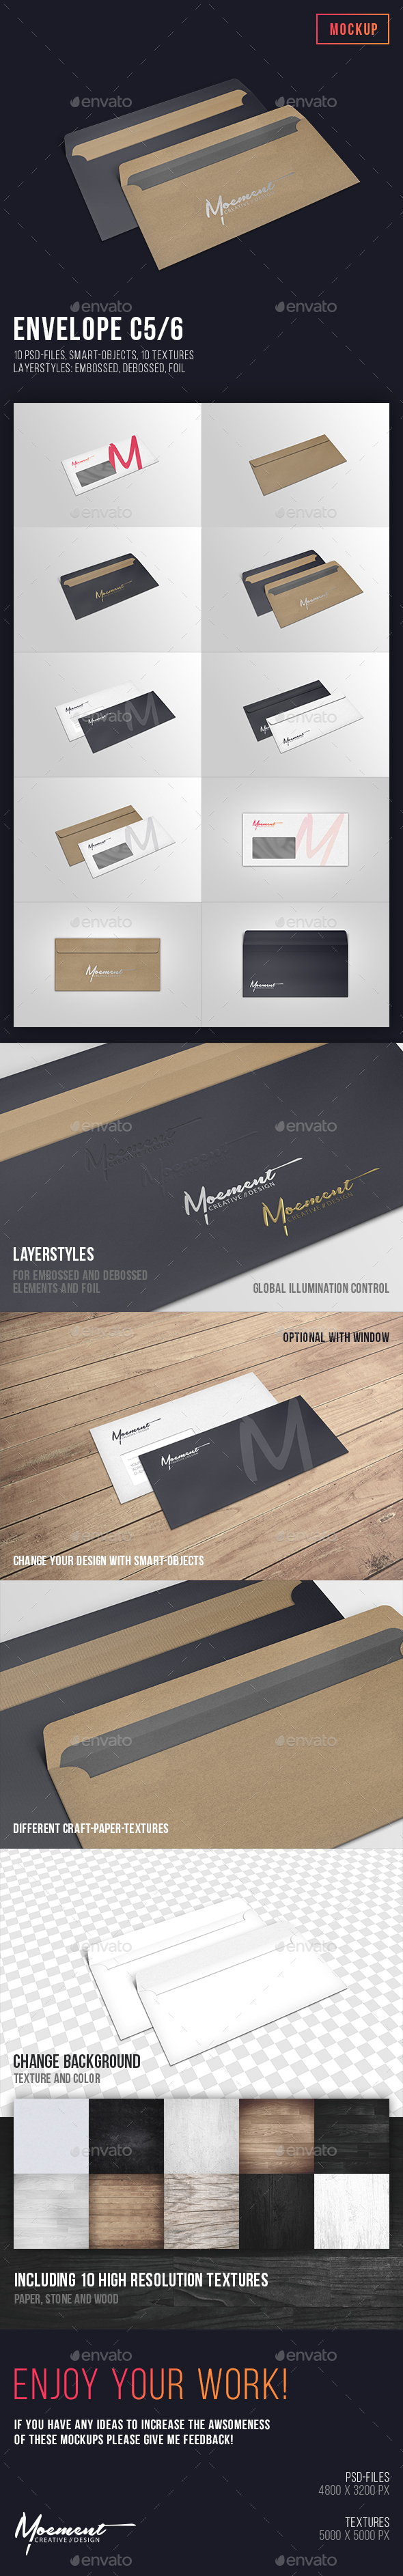 Envelope C5/6 Mockup - Stationery Print